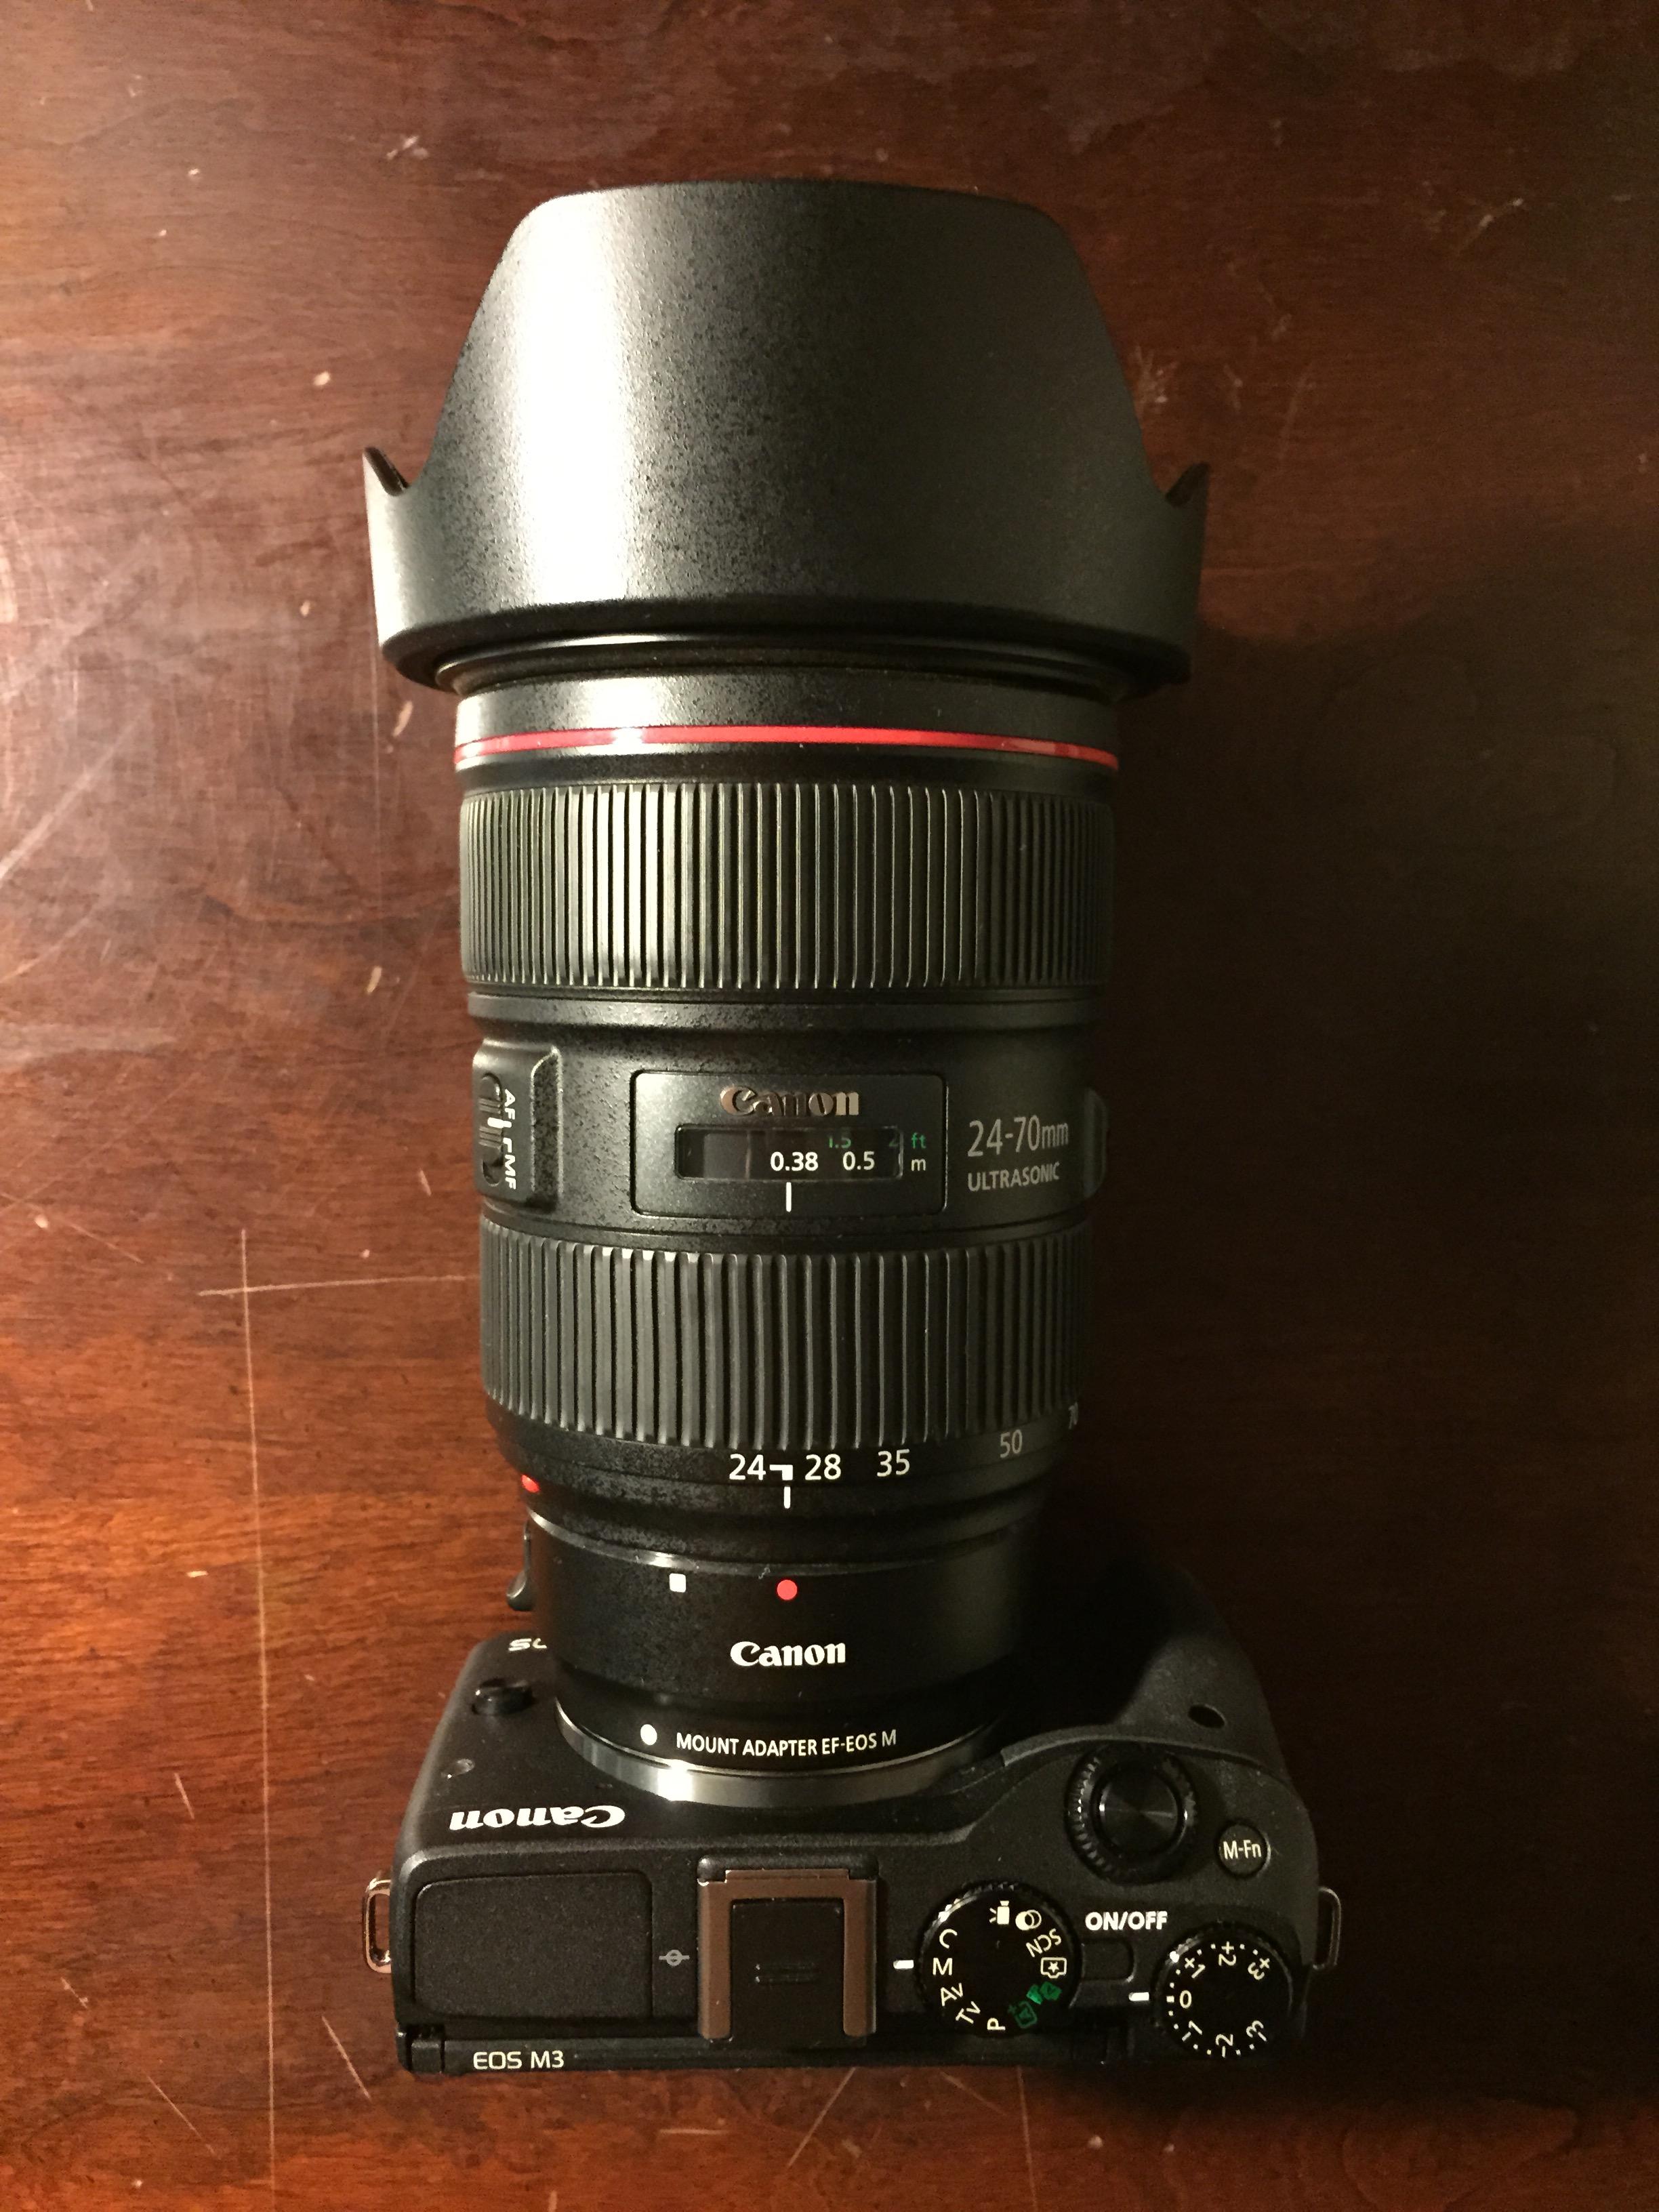 Canon EOS M3 w/ Canon EF 24-70mm f/2.8L II via Canon EOS EF-M adapter